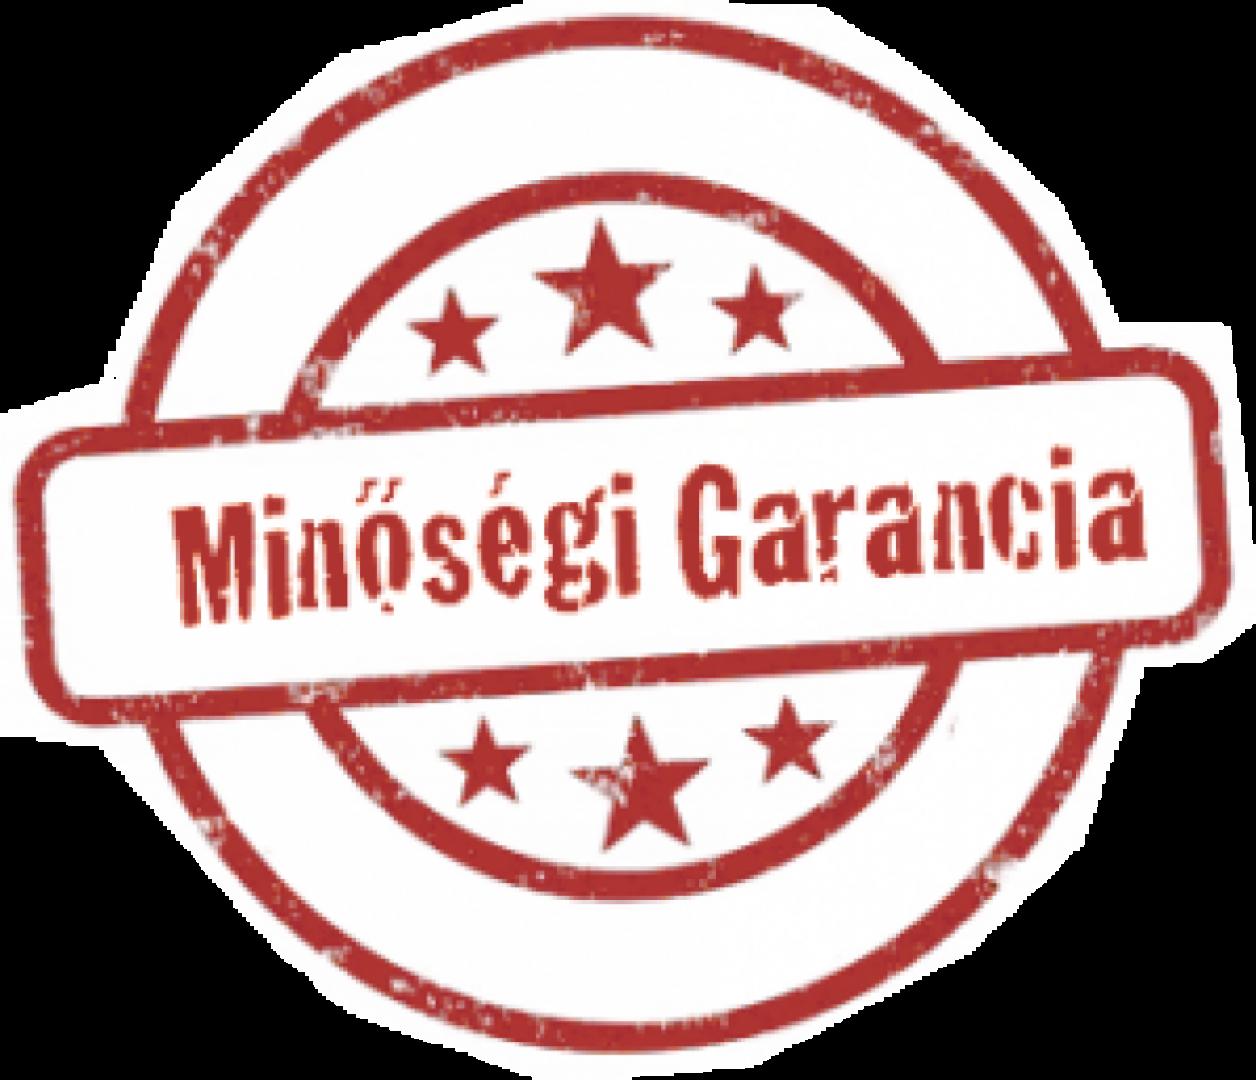 _b_728minosegi_garancia-300x258.png